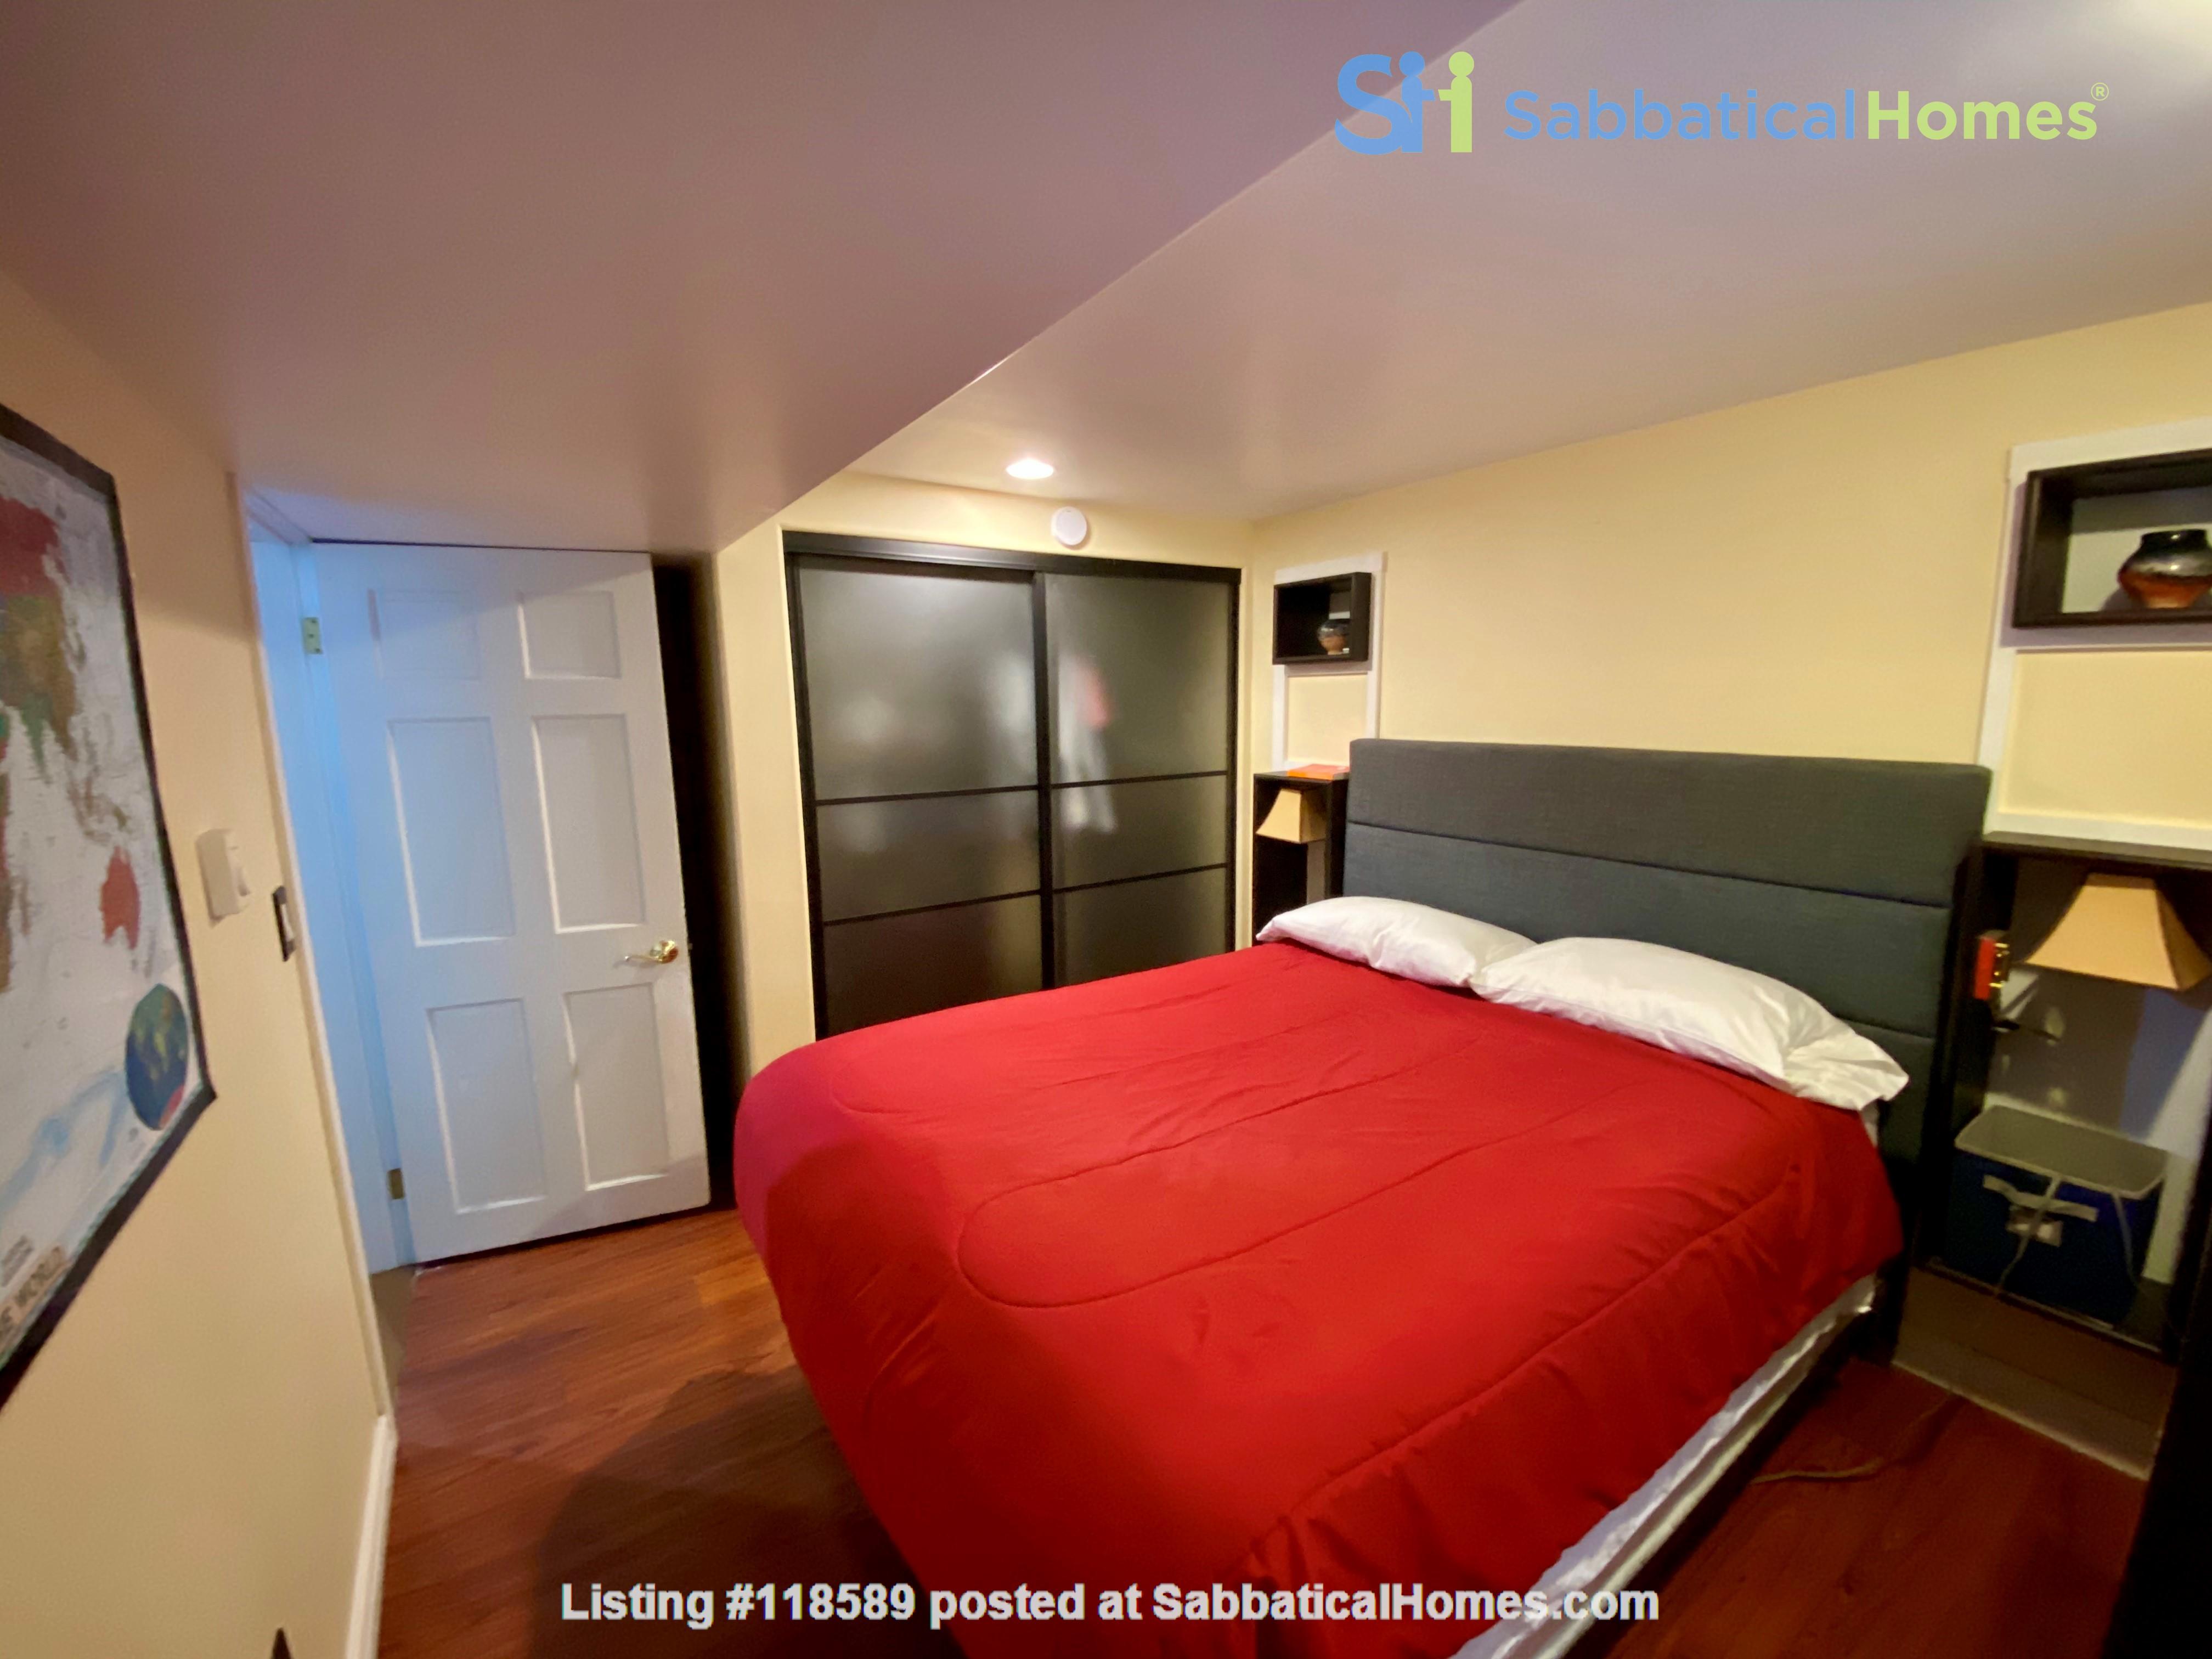 Executive Student Rental near CU Home Rental in Boulder 2